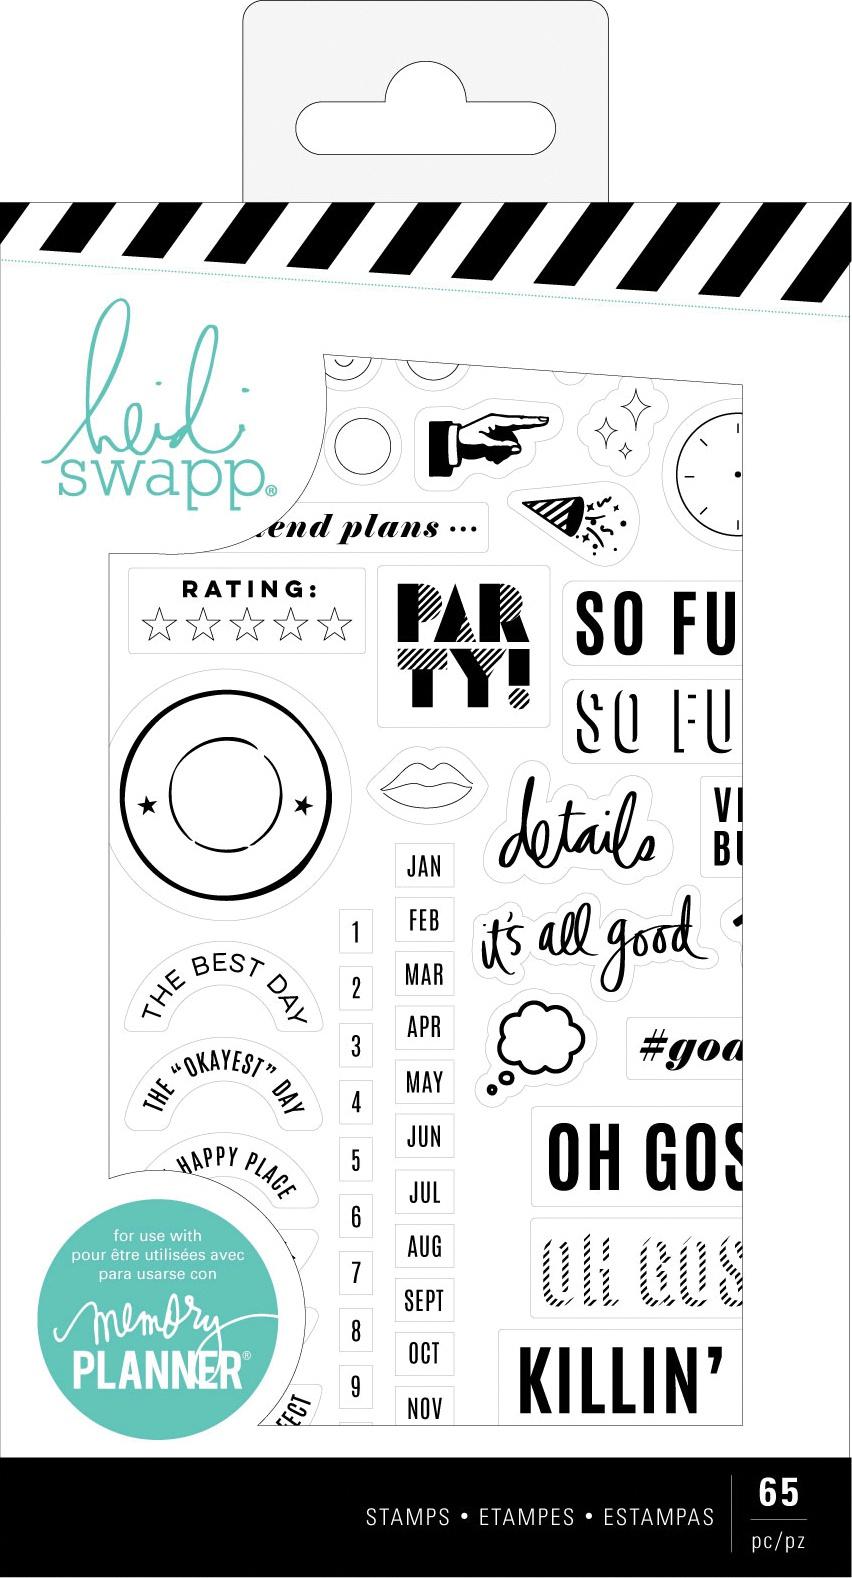 Heidi Swapp - Memory Planner Stamps